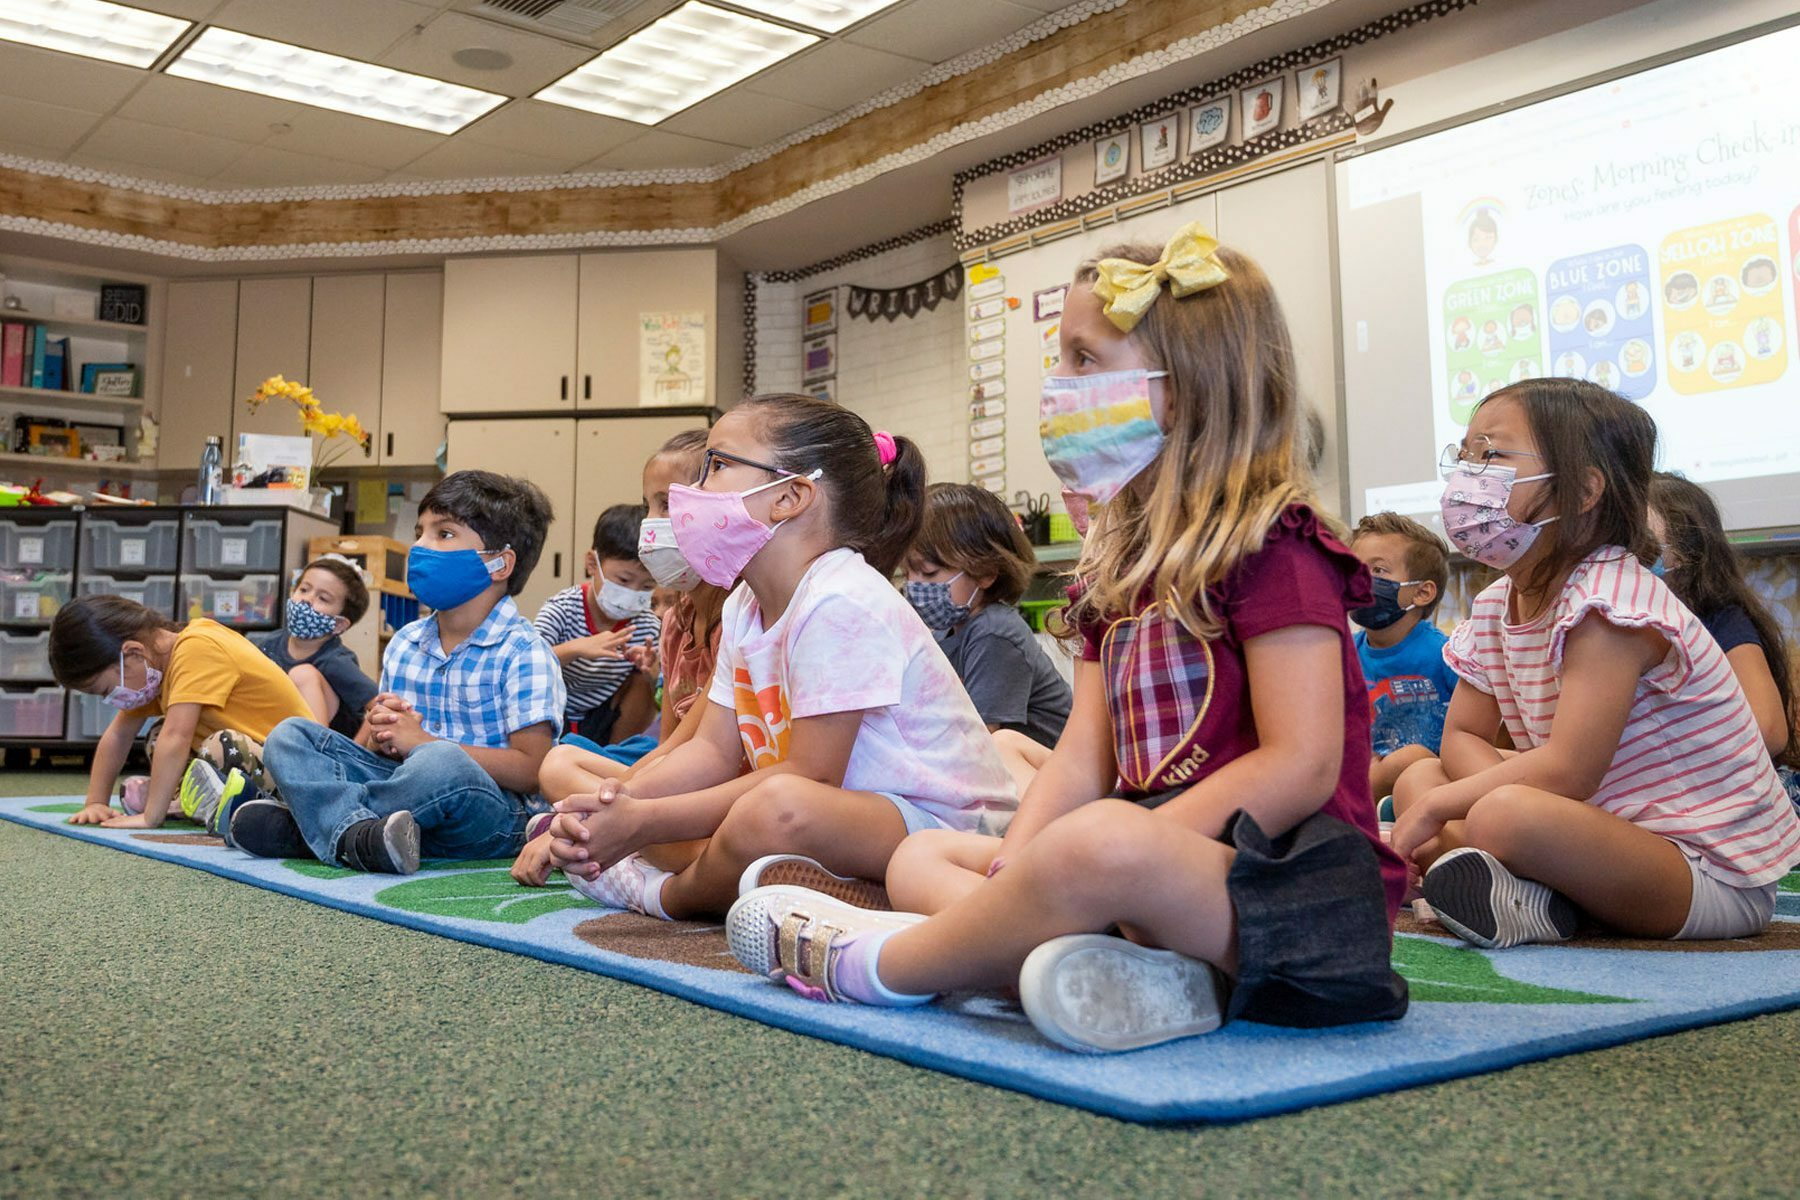 Students listen to their teacher during their first day of kindergarten.